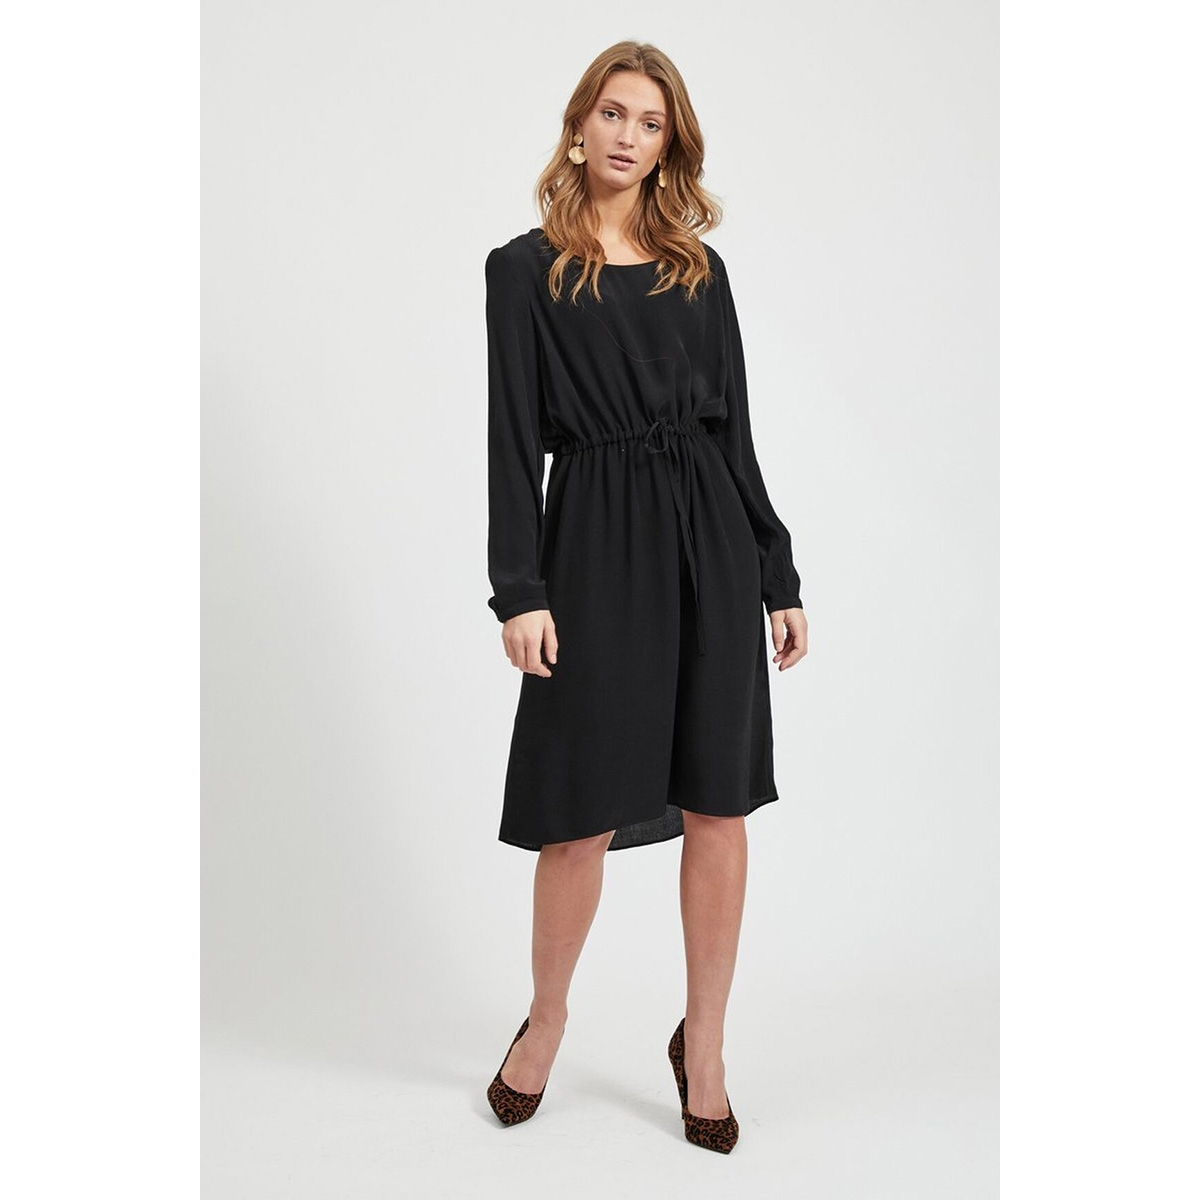 viprimera midi l/s dress-fav nx 14055394 vila jurk black